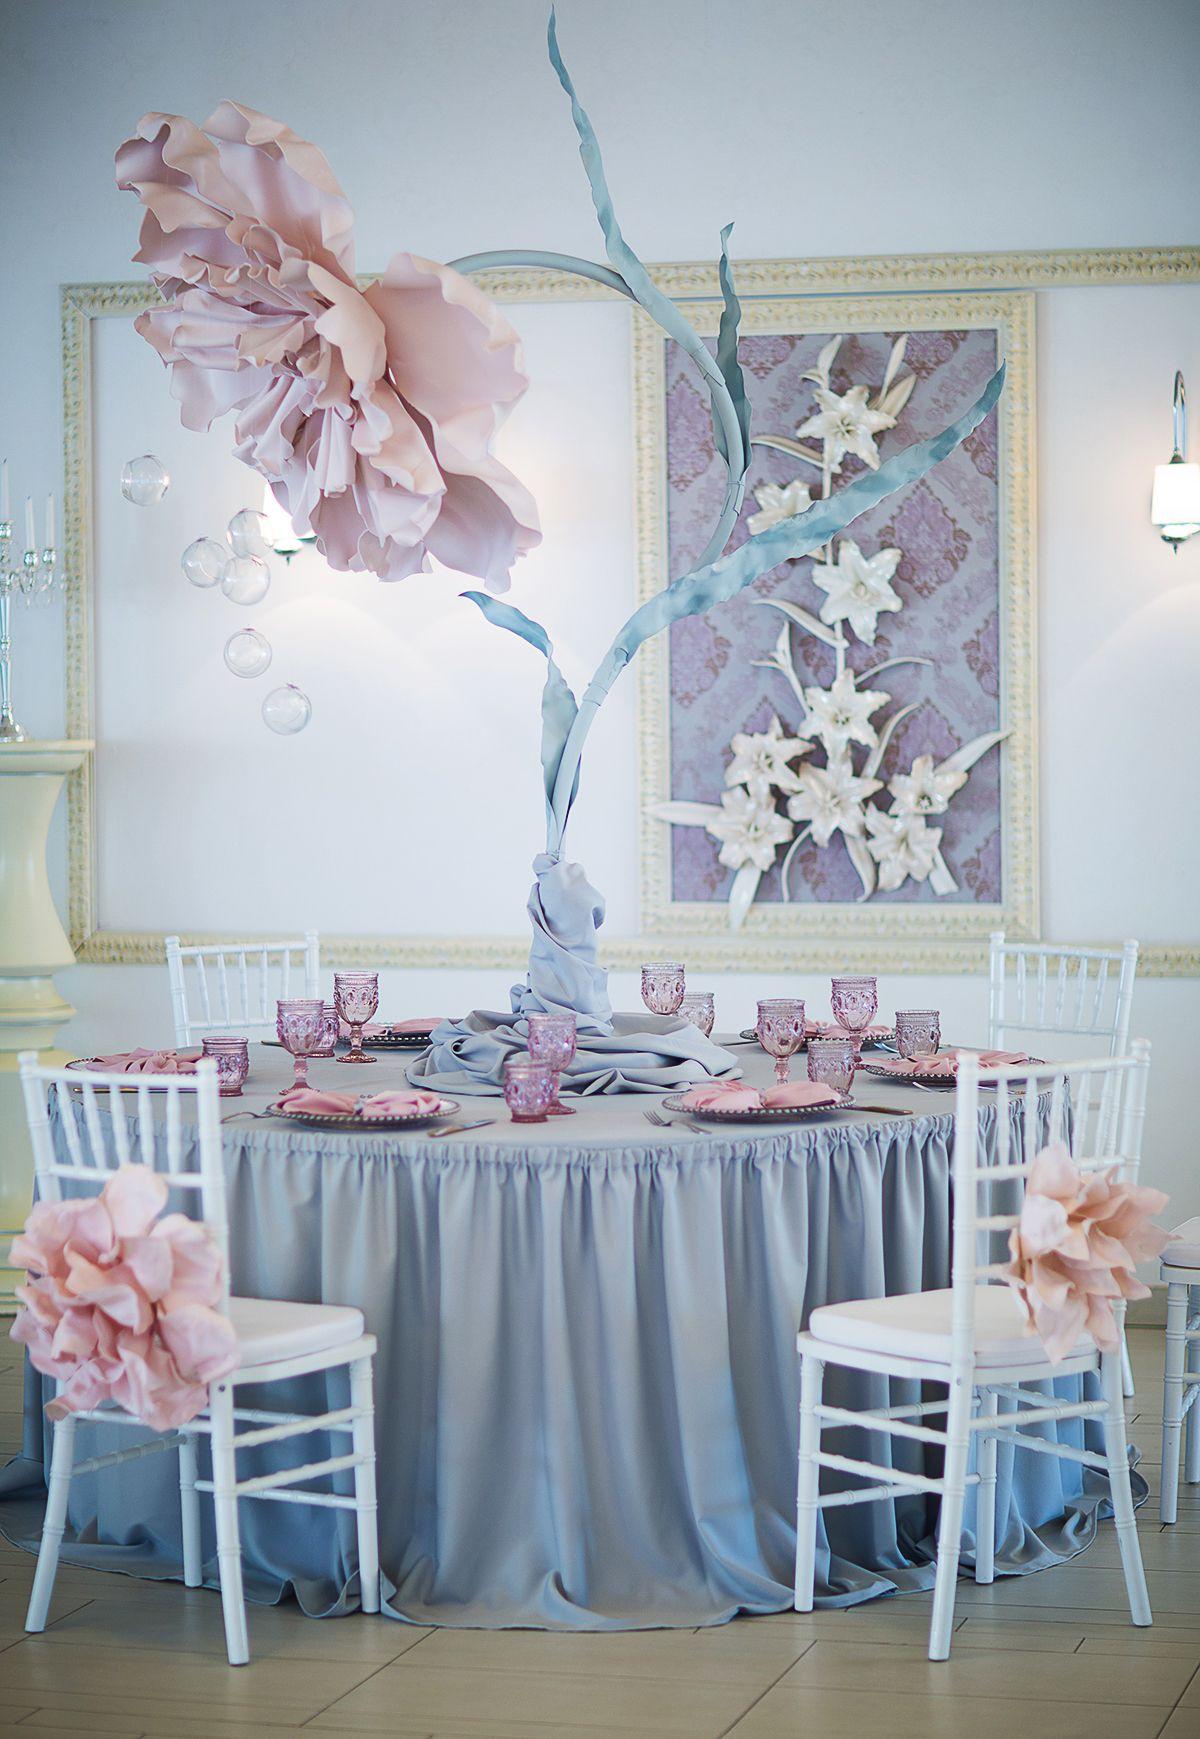 Wedding decoration ideas colors  Photographer Helen Shvaiko Фотограф Елена Швайко magicphoto